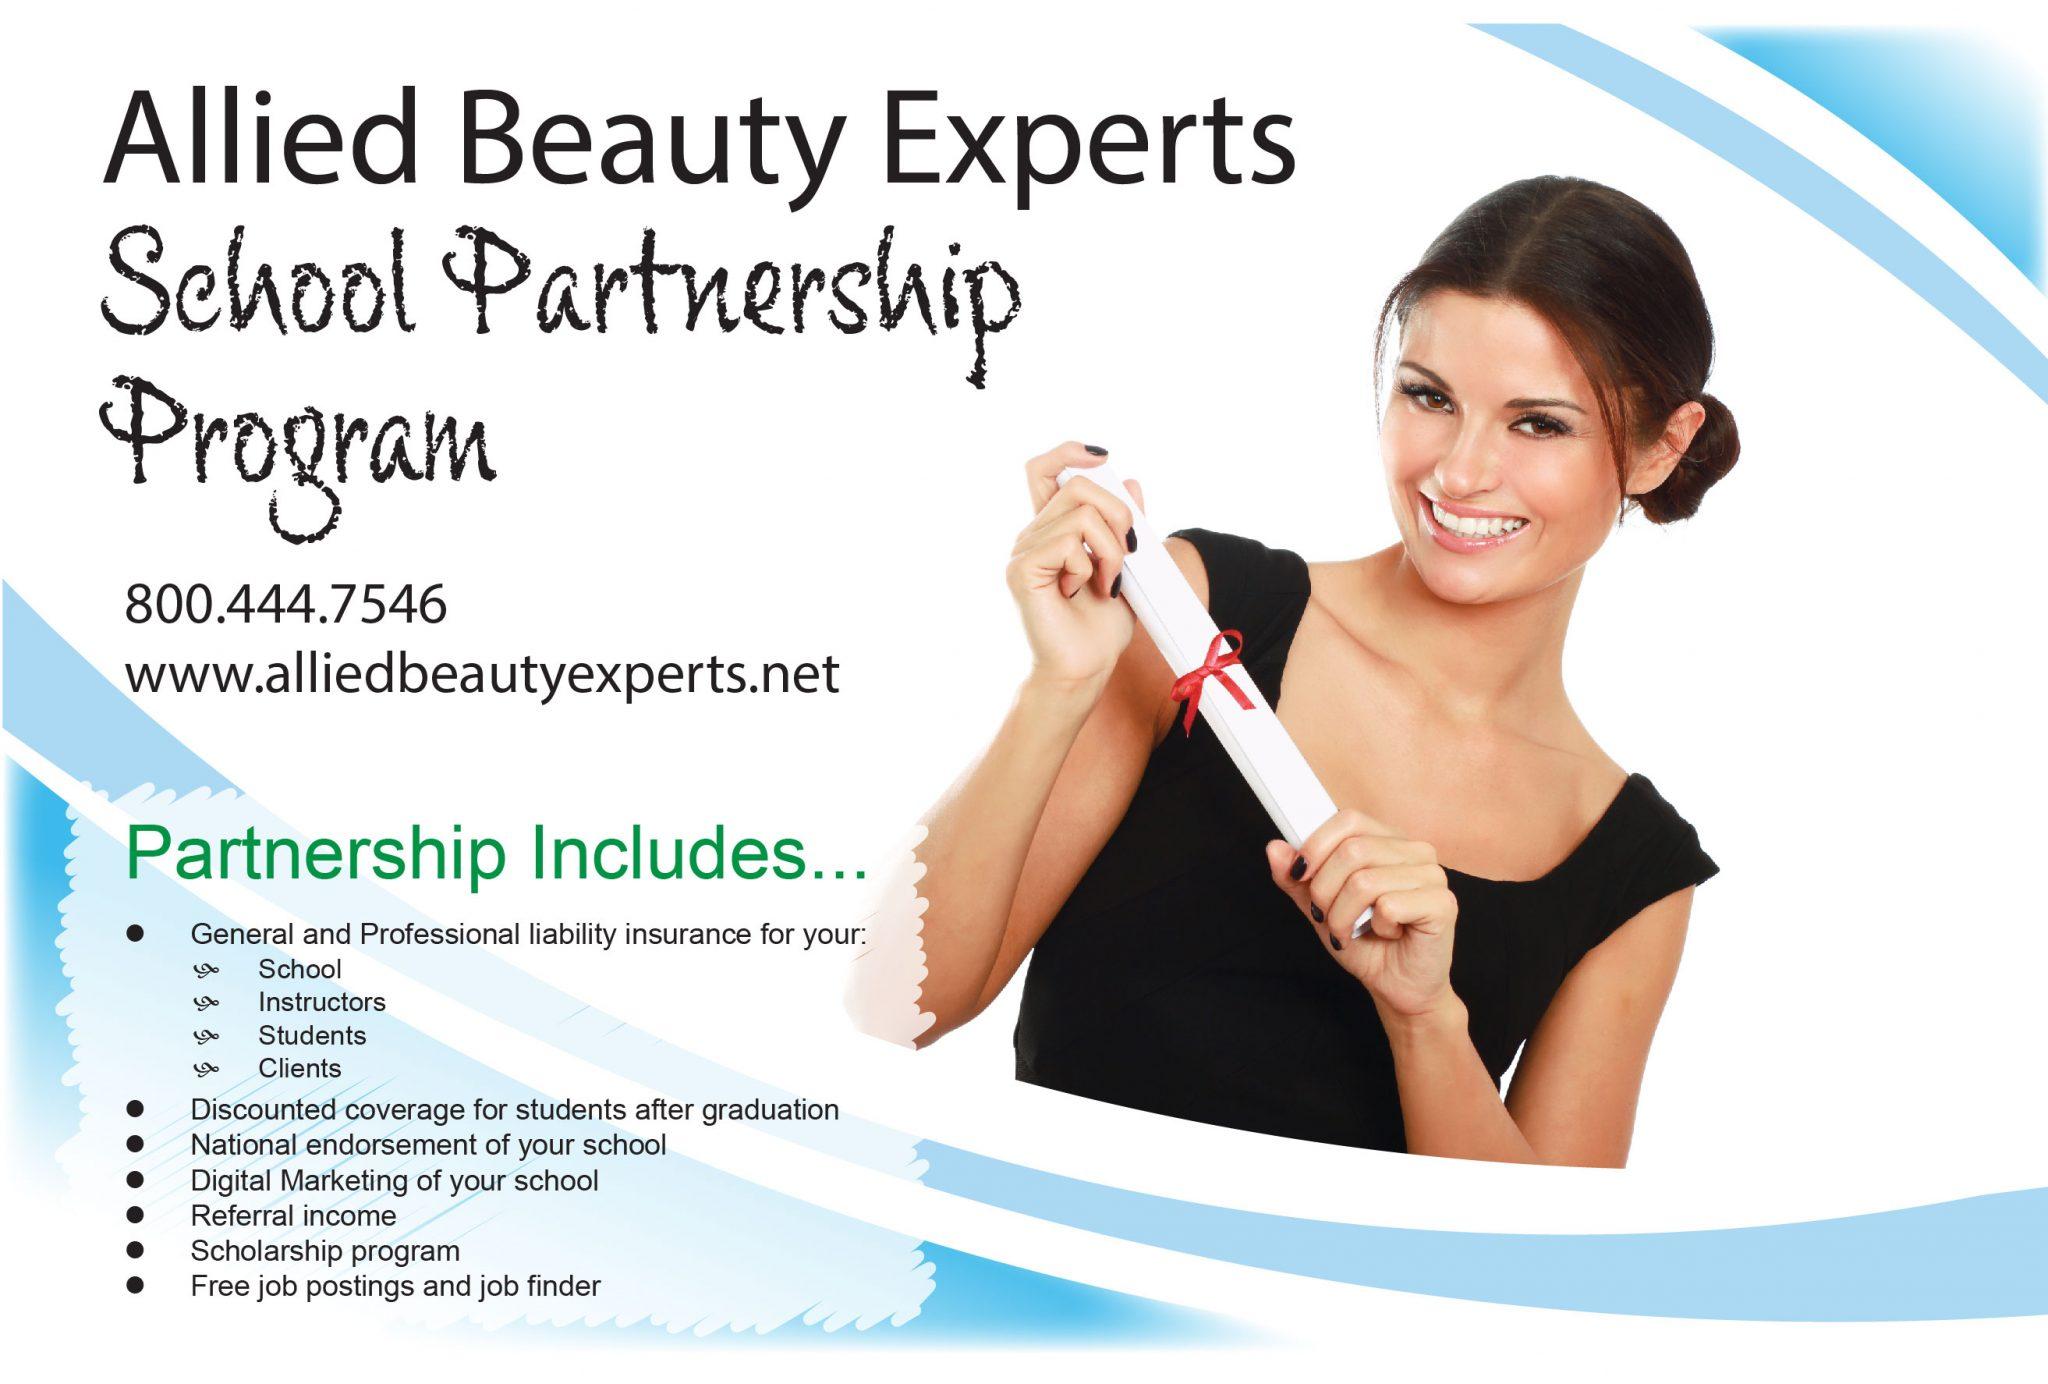 Allied Beauty Experts School Partnership Program image